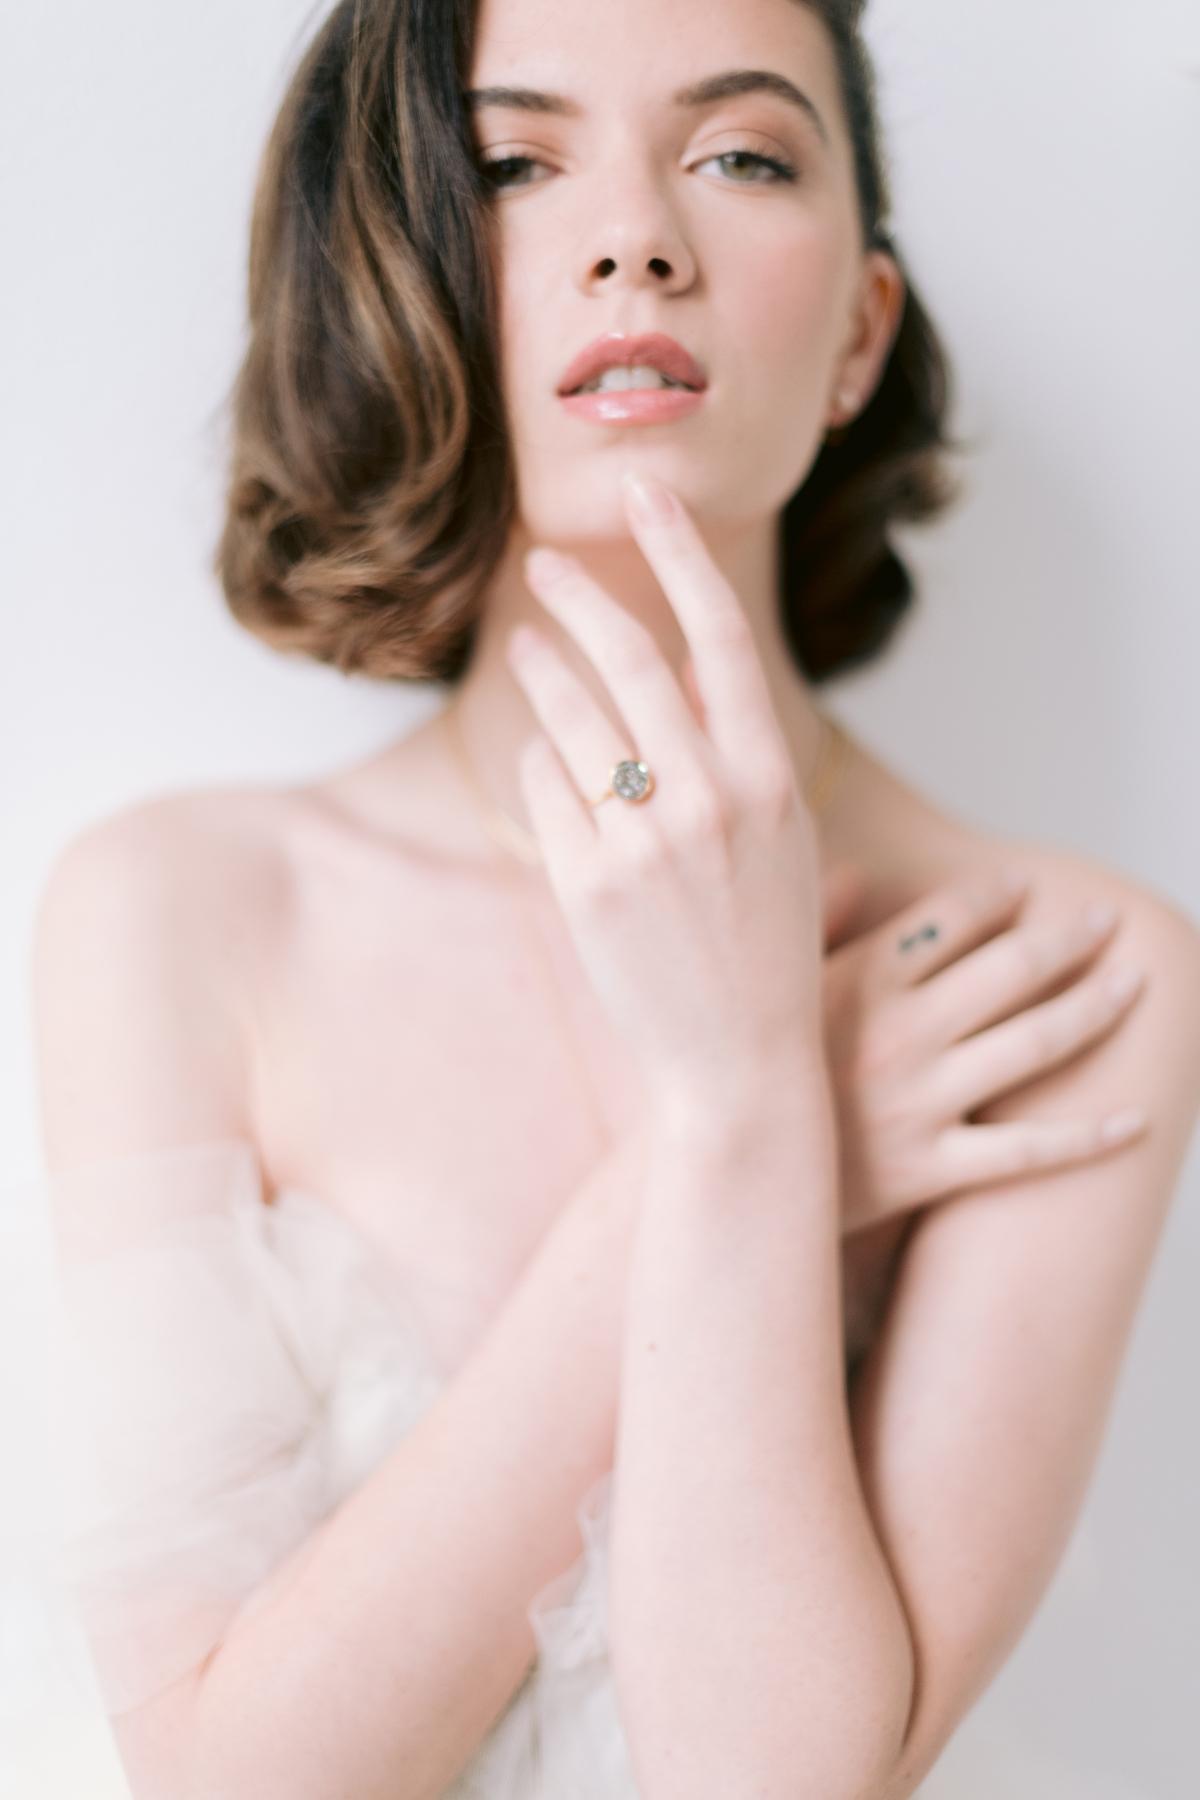 Laura Lanzerotte Bridal Danielle Heinson Photography 34